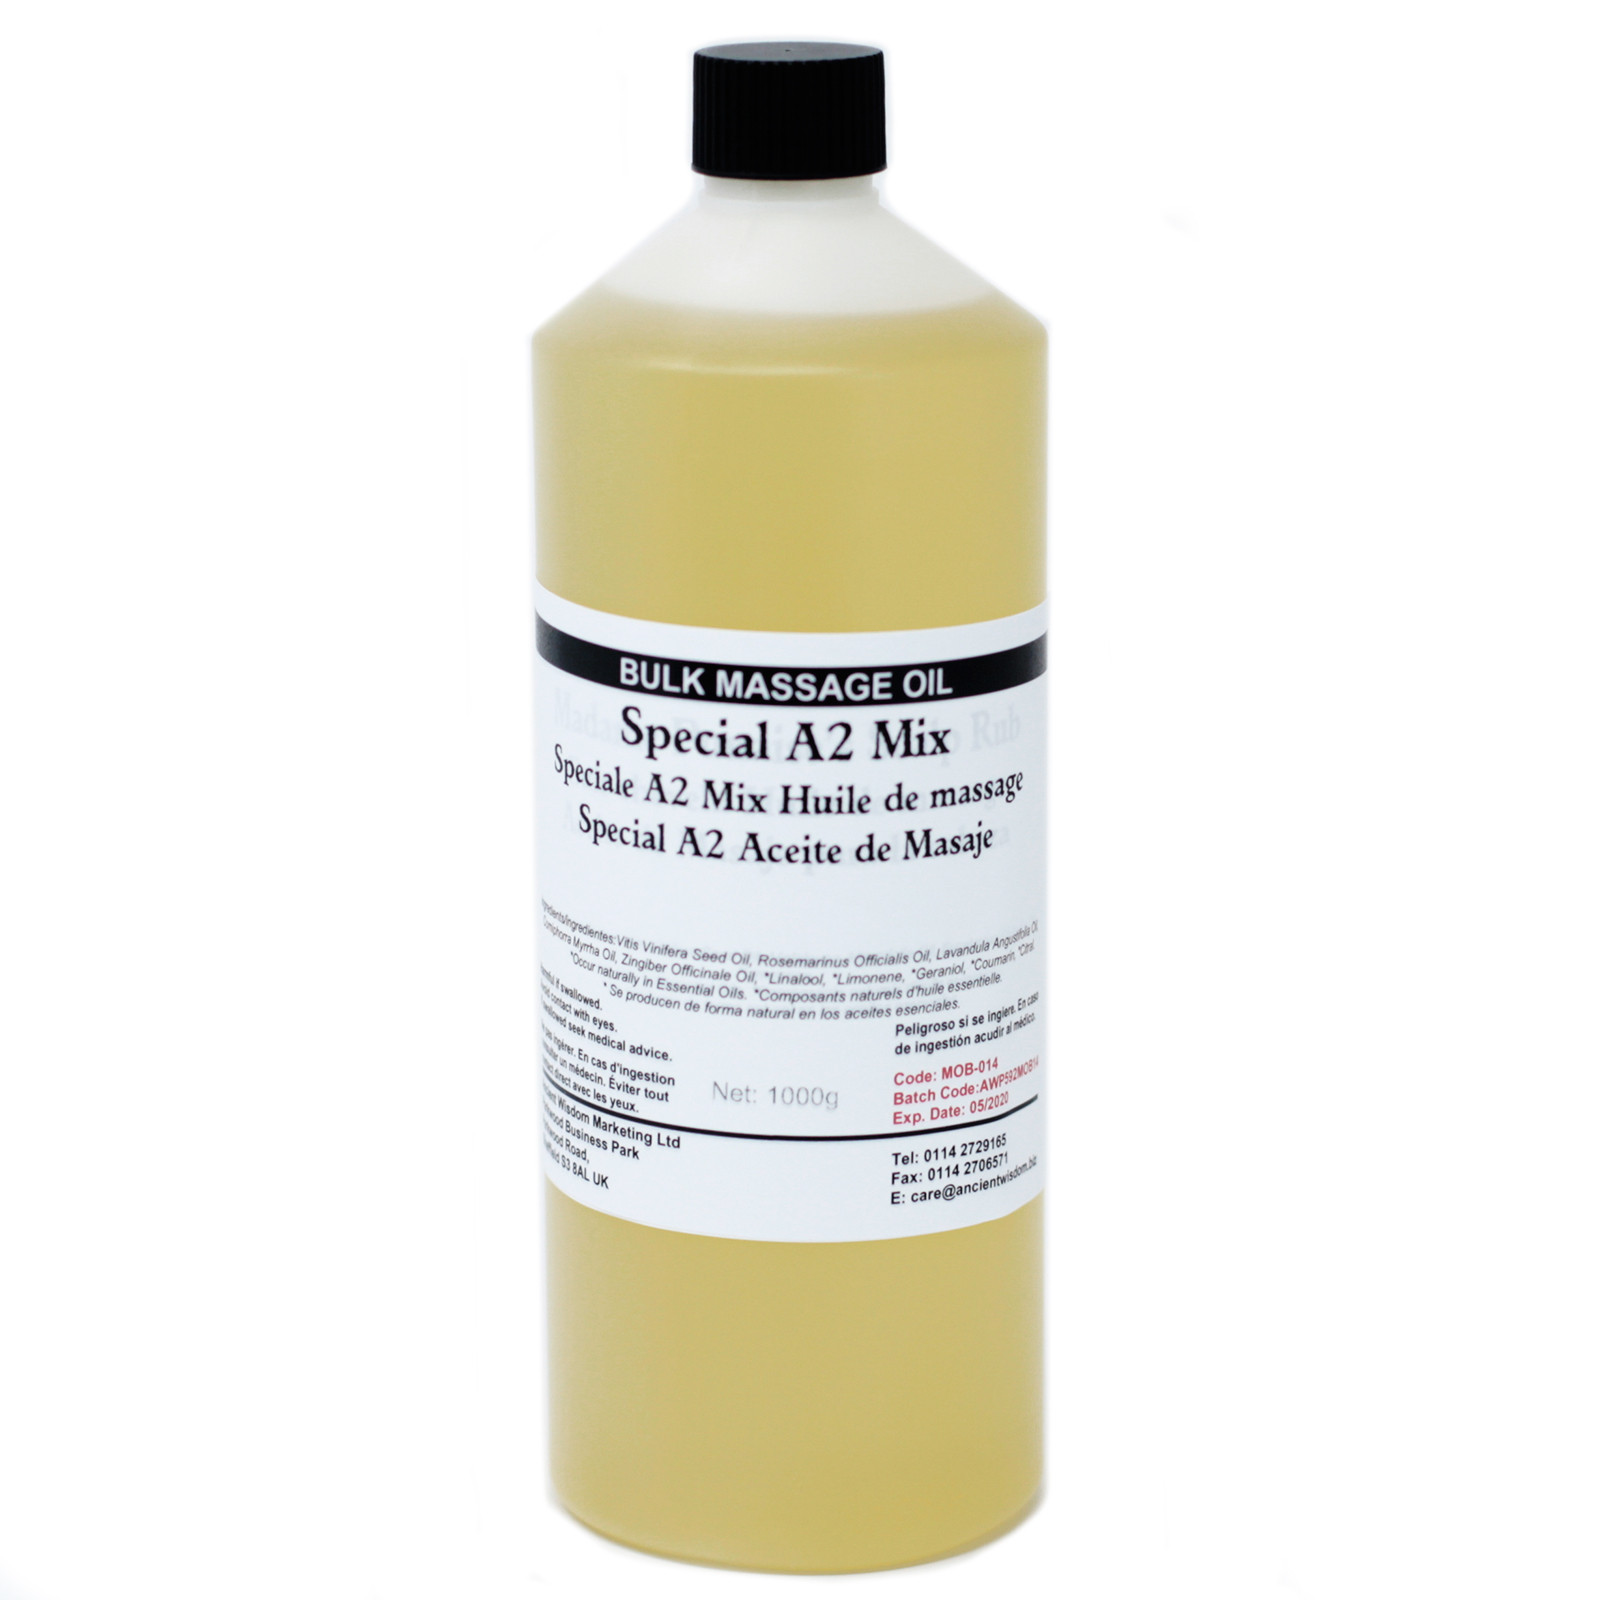 Special A2 Mix 1Kg Massage Oil